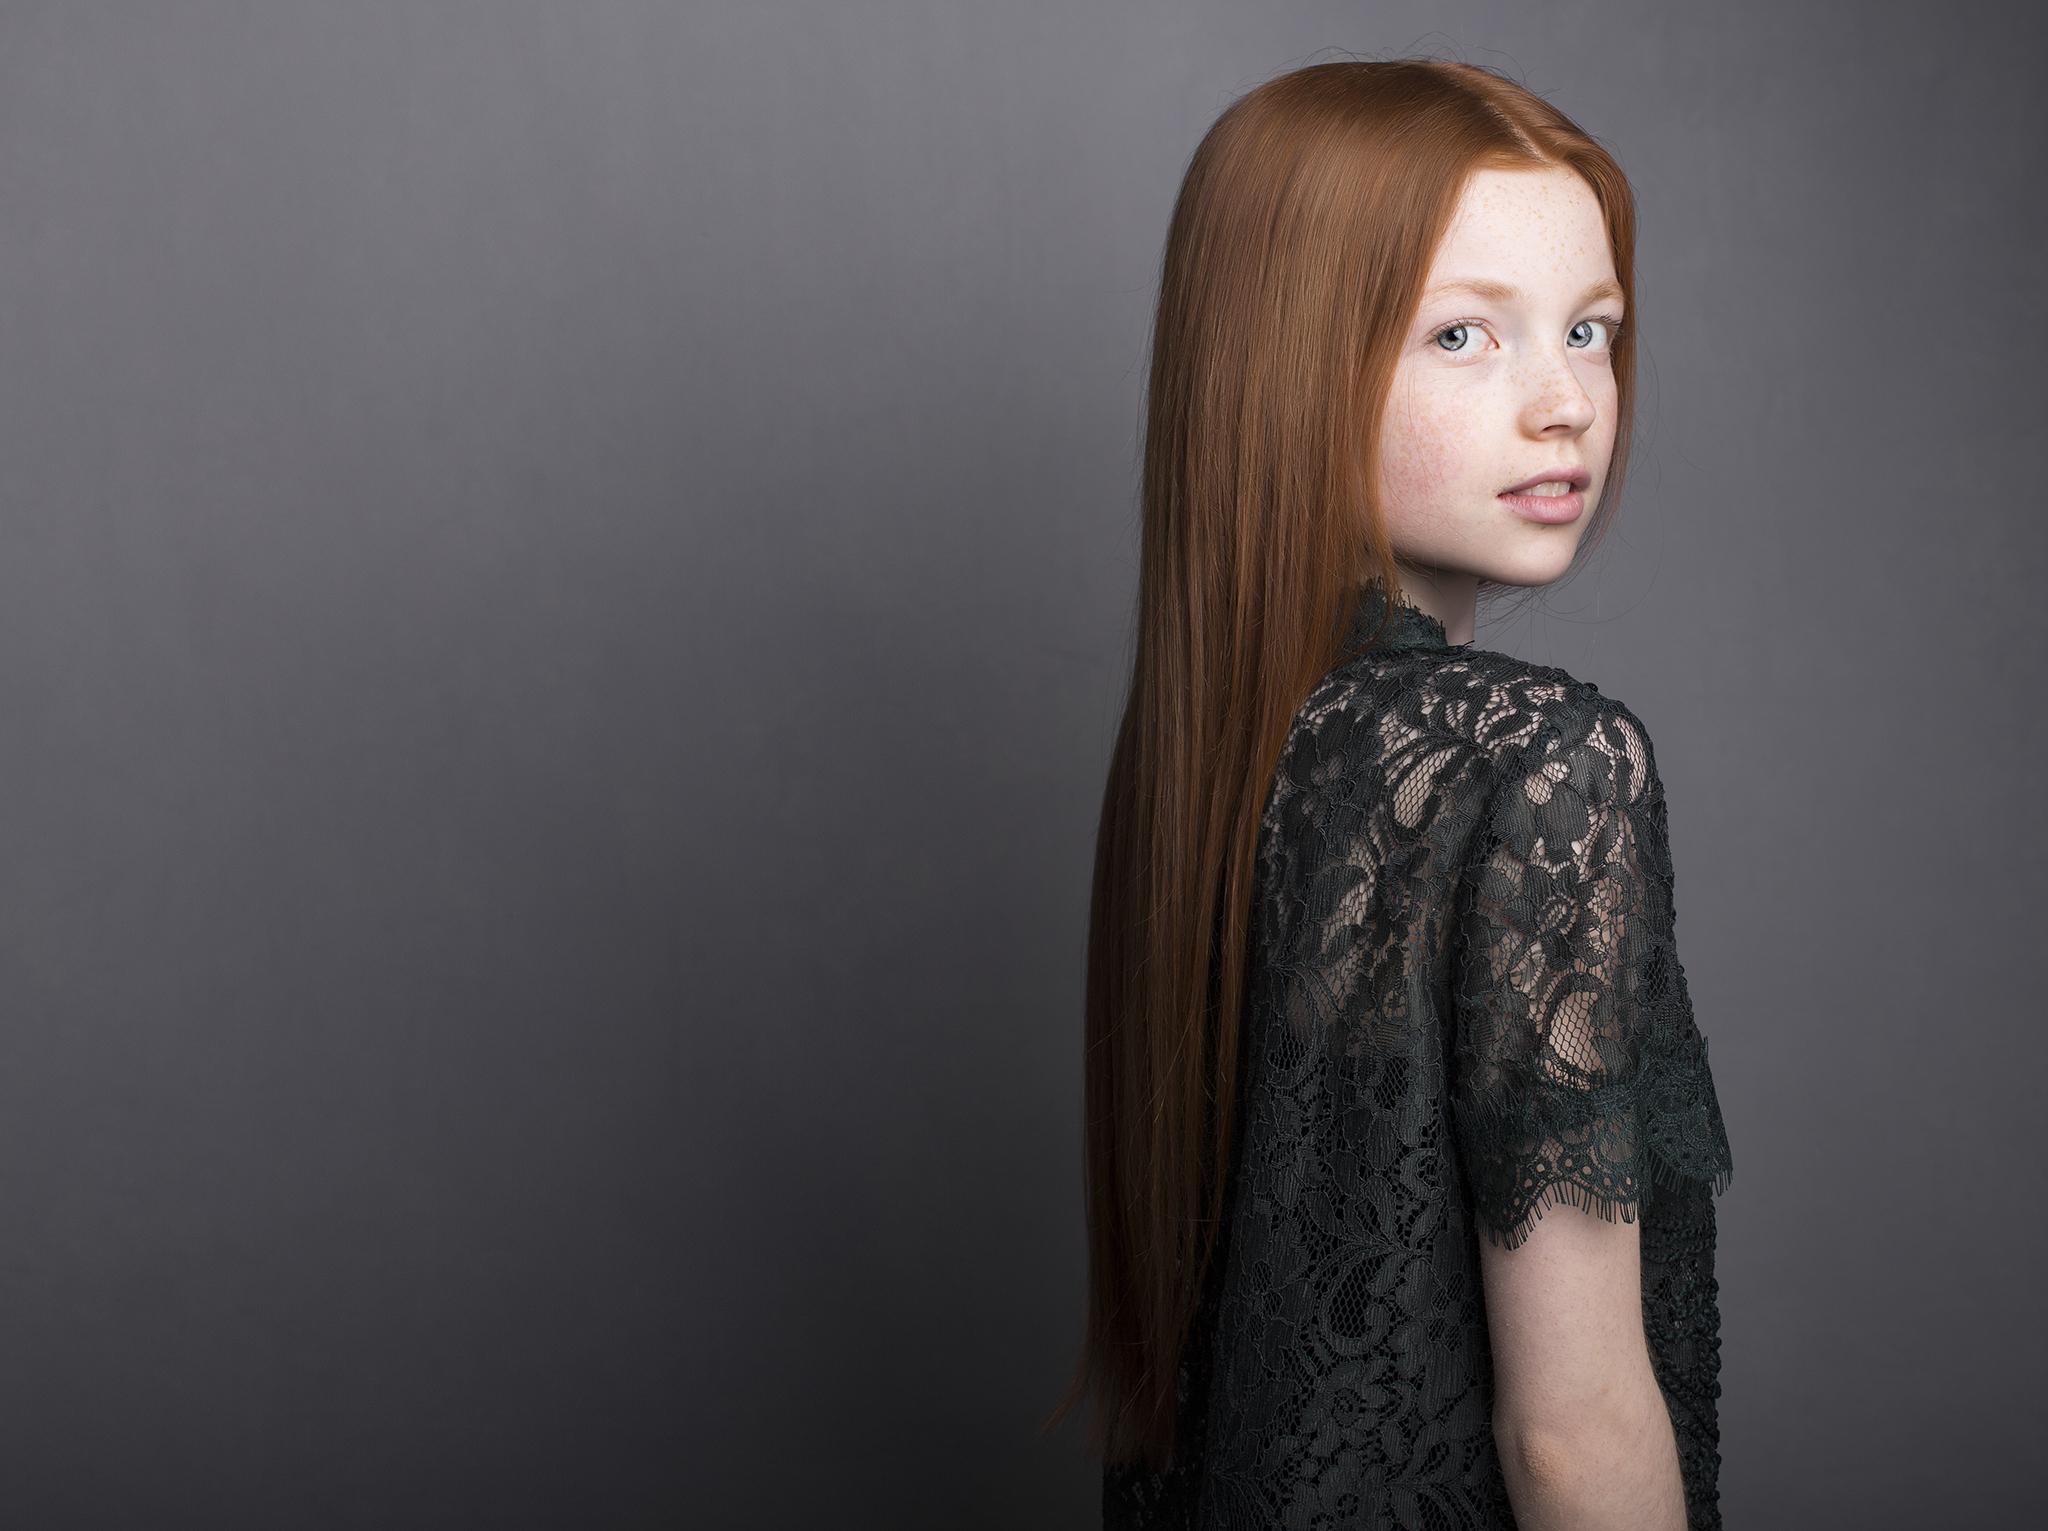 Elizabethg_fineart_portrait_photography_esme_kidslondon_model_agency_007.jpg